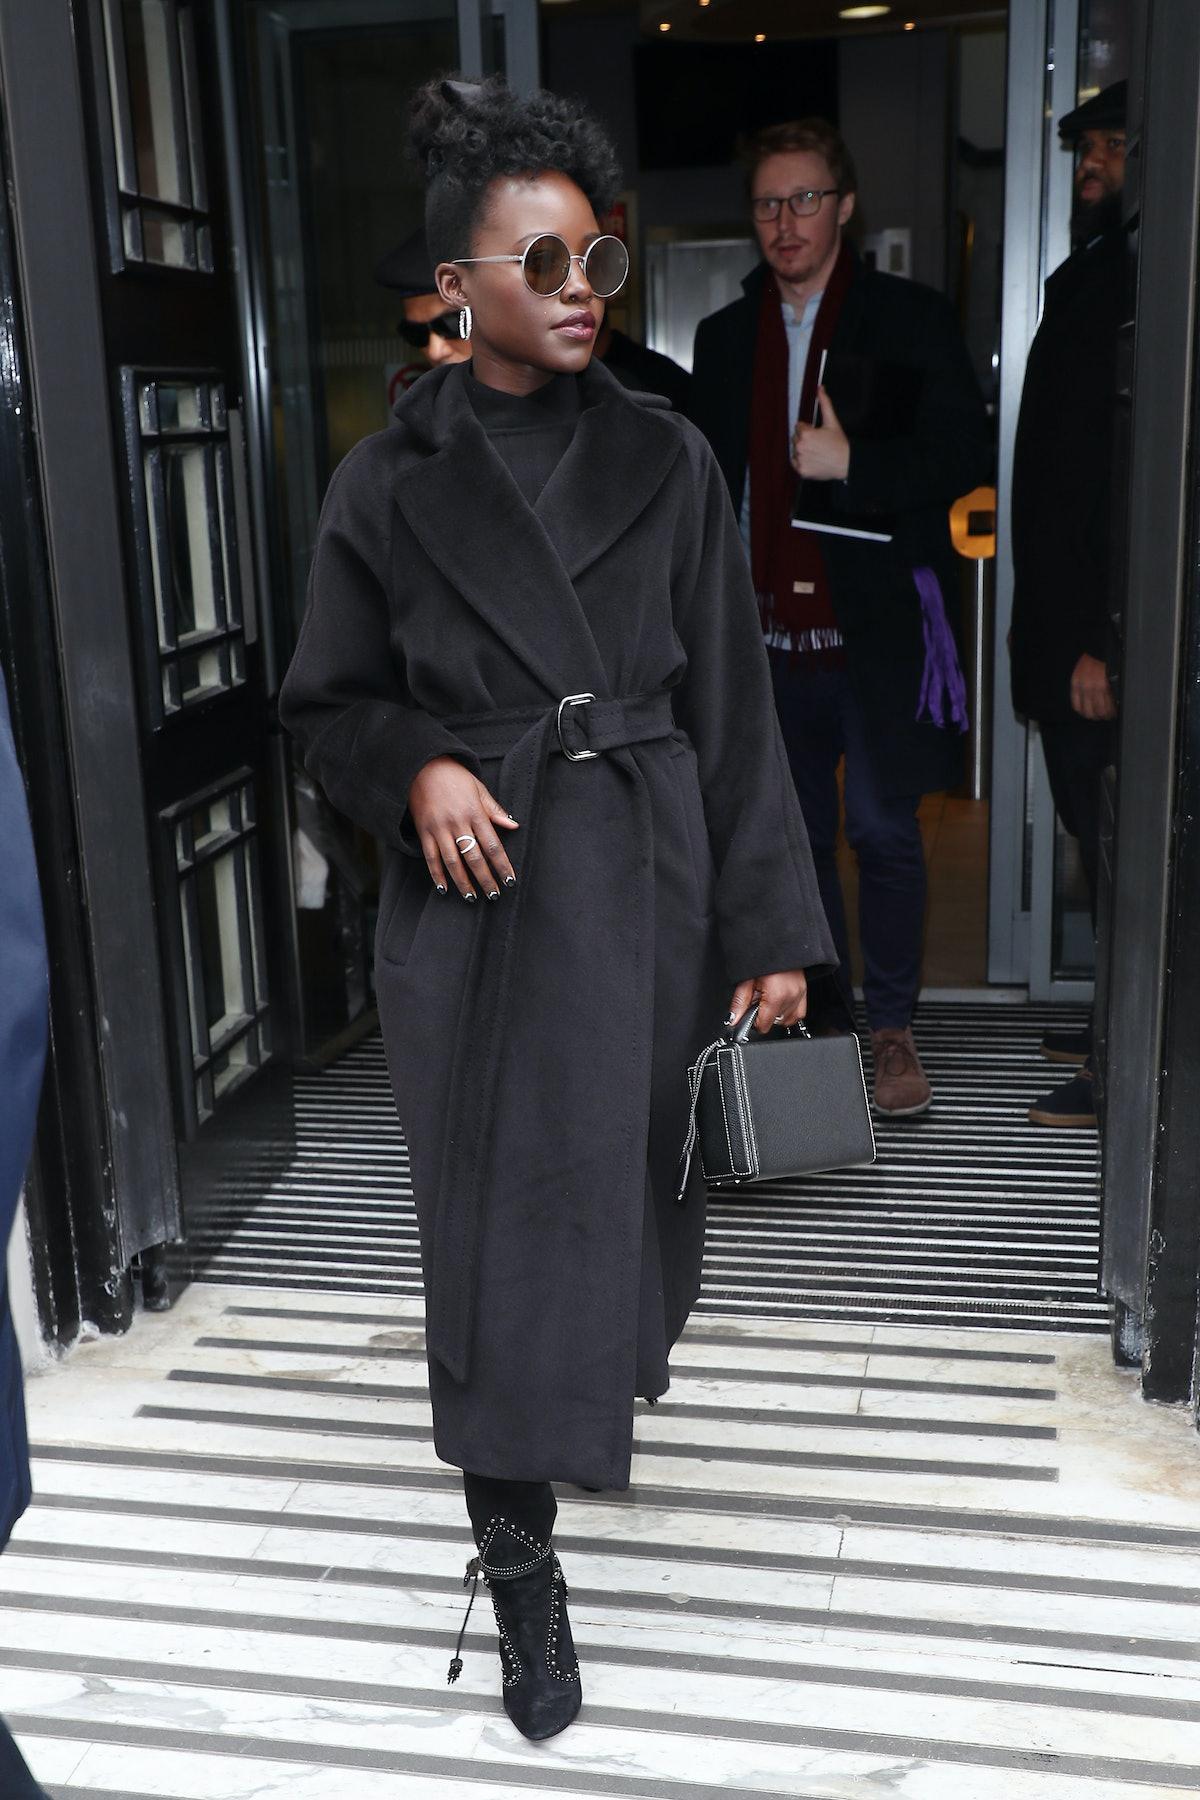 London Celebrity Sightings -  March 15, 2019